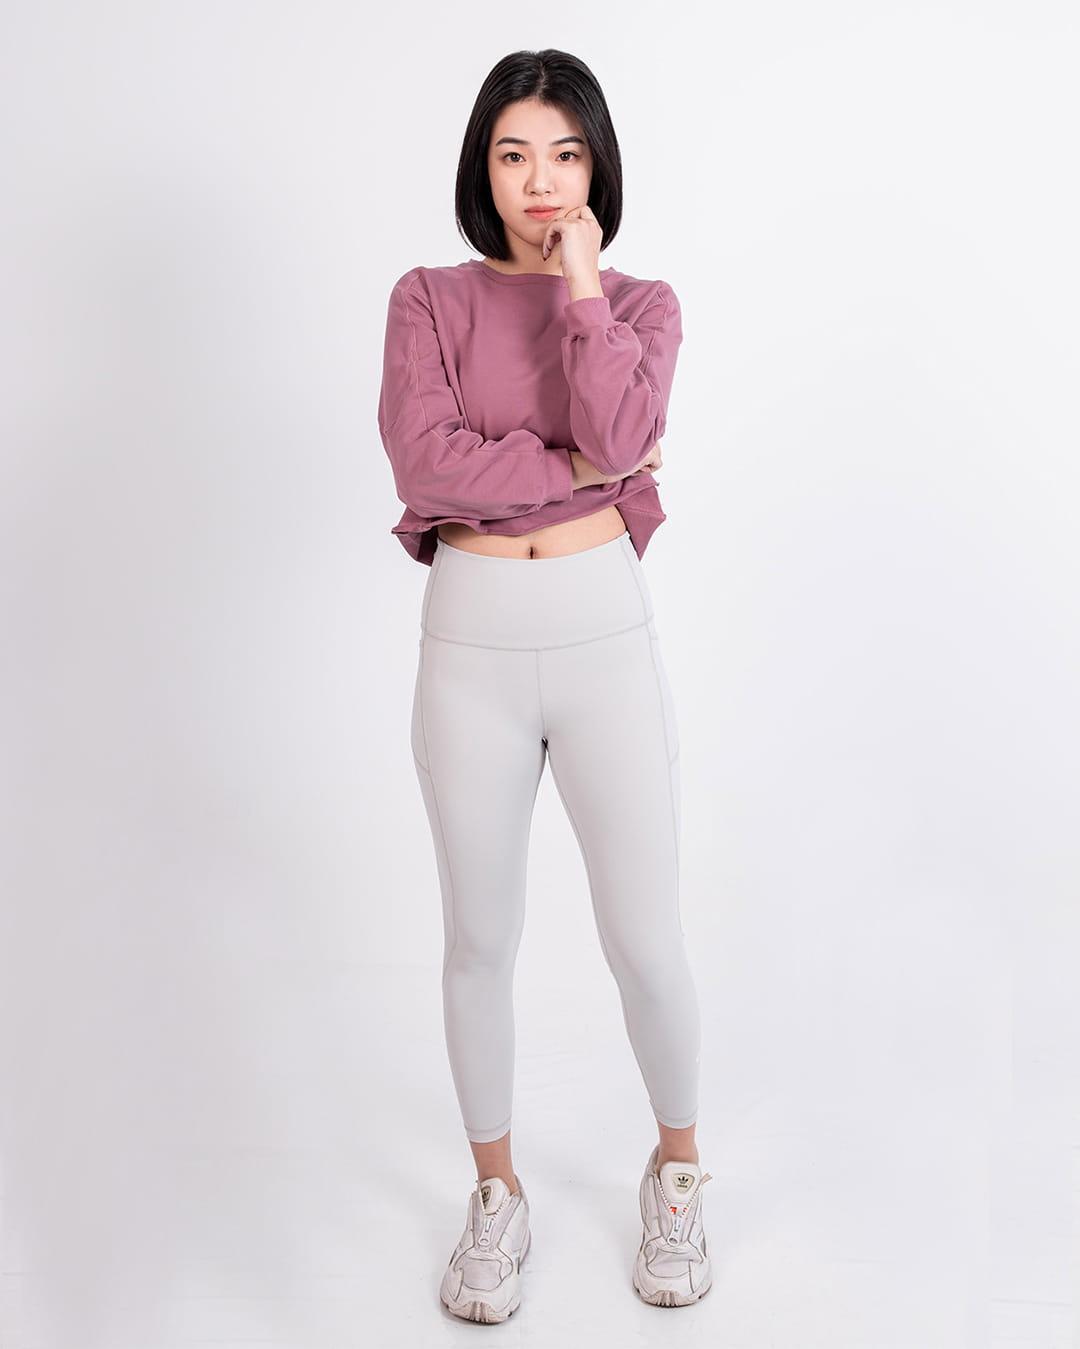 【GLADE.】Fit Me 九分緊身褲 (芝麻牛奶) 2